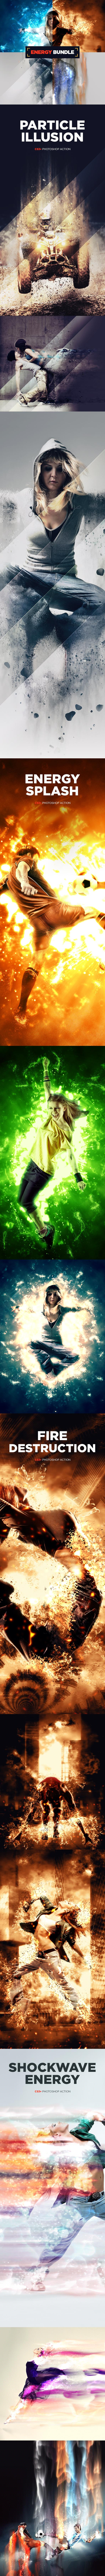 Energy Bundle Photoshop Actions CS3+ - Photo Effects Actions